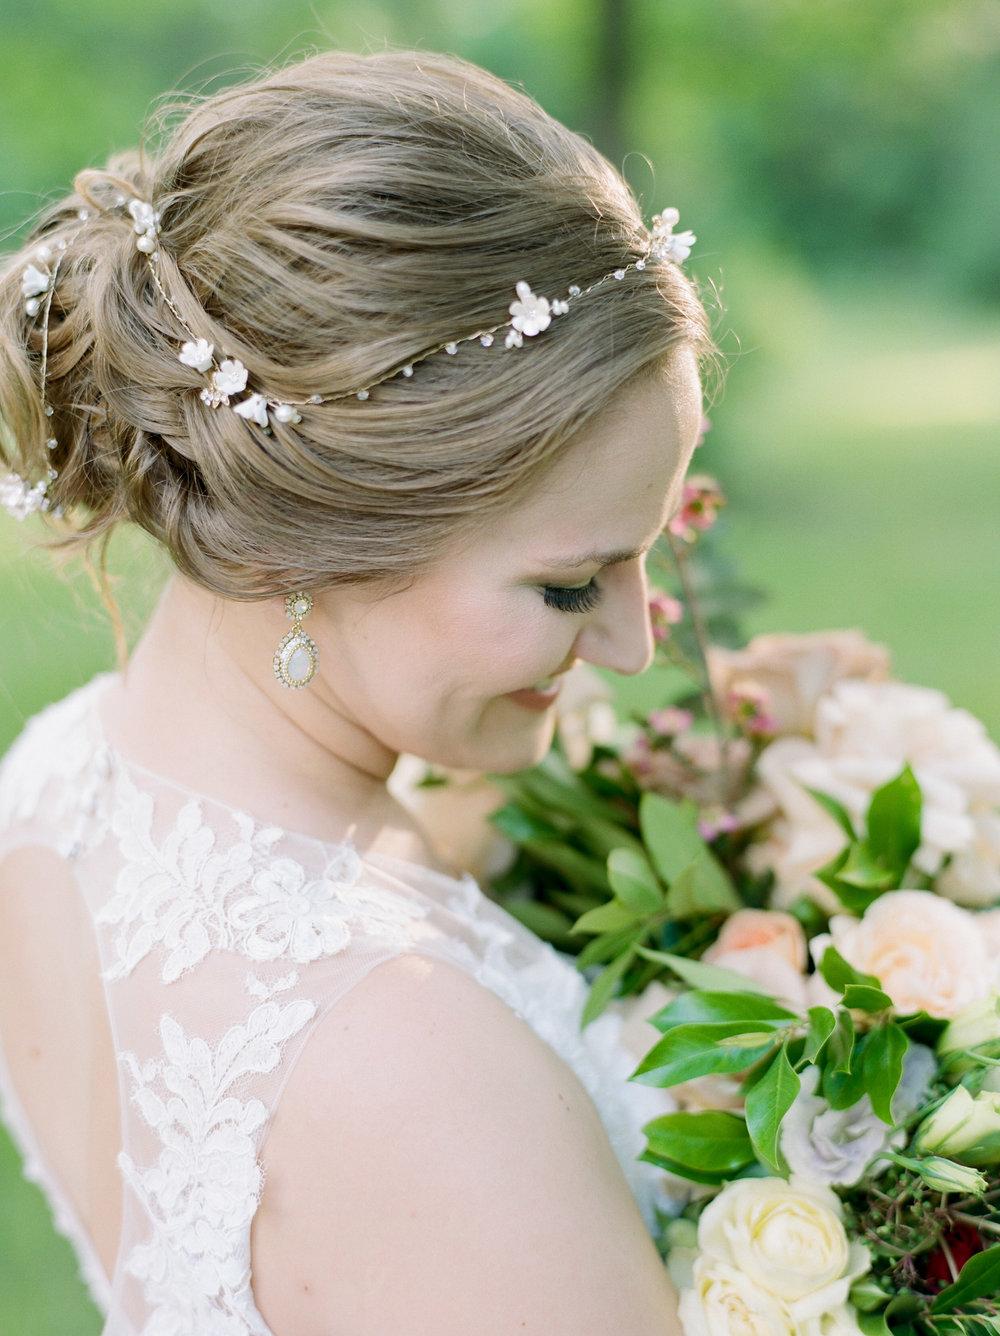 Houston-Fine-Art-Film-Destination-Wedding-Photographer-Top-Best-Luxury-Josh-Dana-Fernandez-Photographer-Austin-Texas-15.jpg